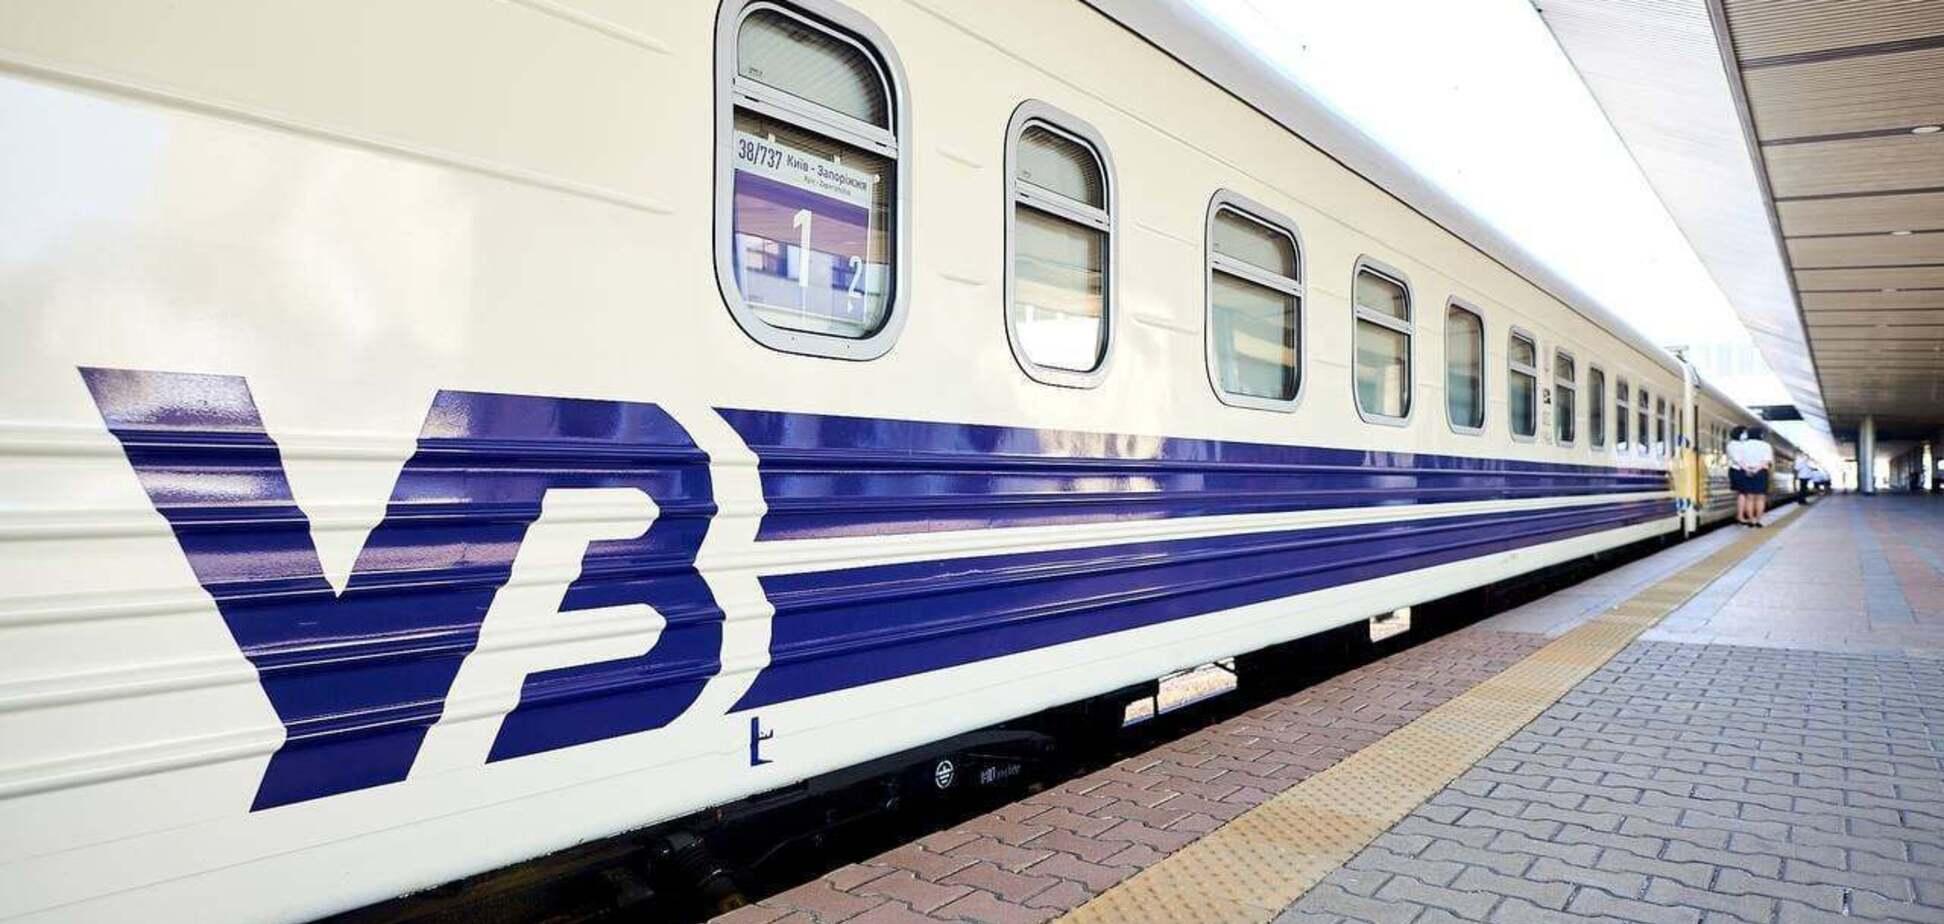 'Укрзалізниця' объявила о закупке поездов